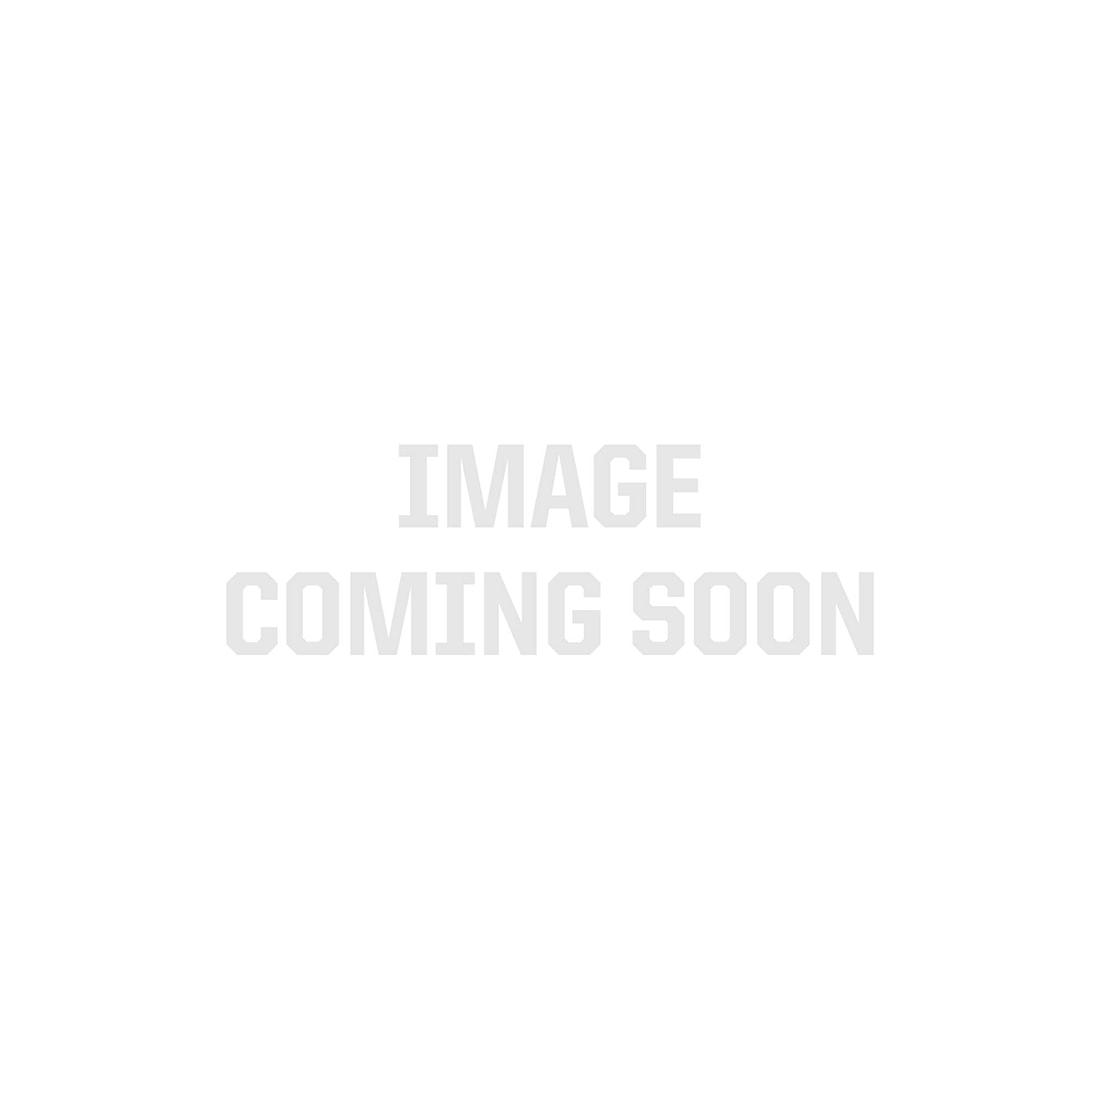 Waterproof Amber 3528 Quad Row LED Strip Light, 450/m, 28mm wide, Sample Kit